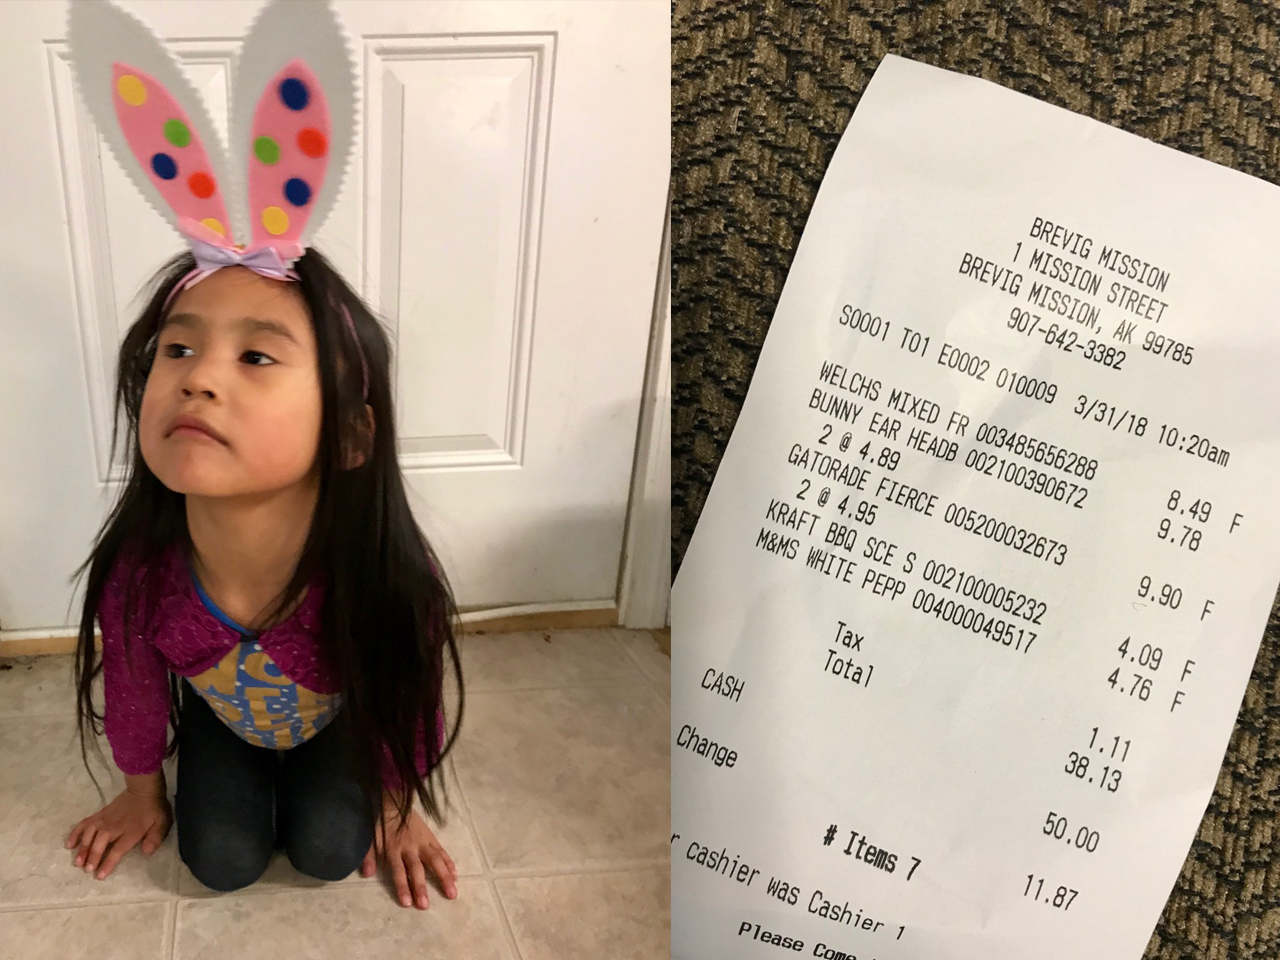 Shopping in Bush Alaska: Easter Edition Bunny and Receipt